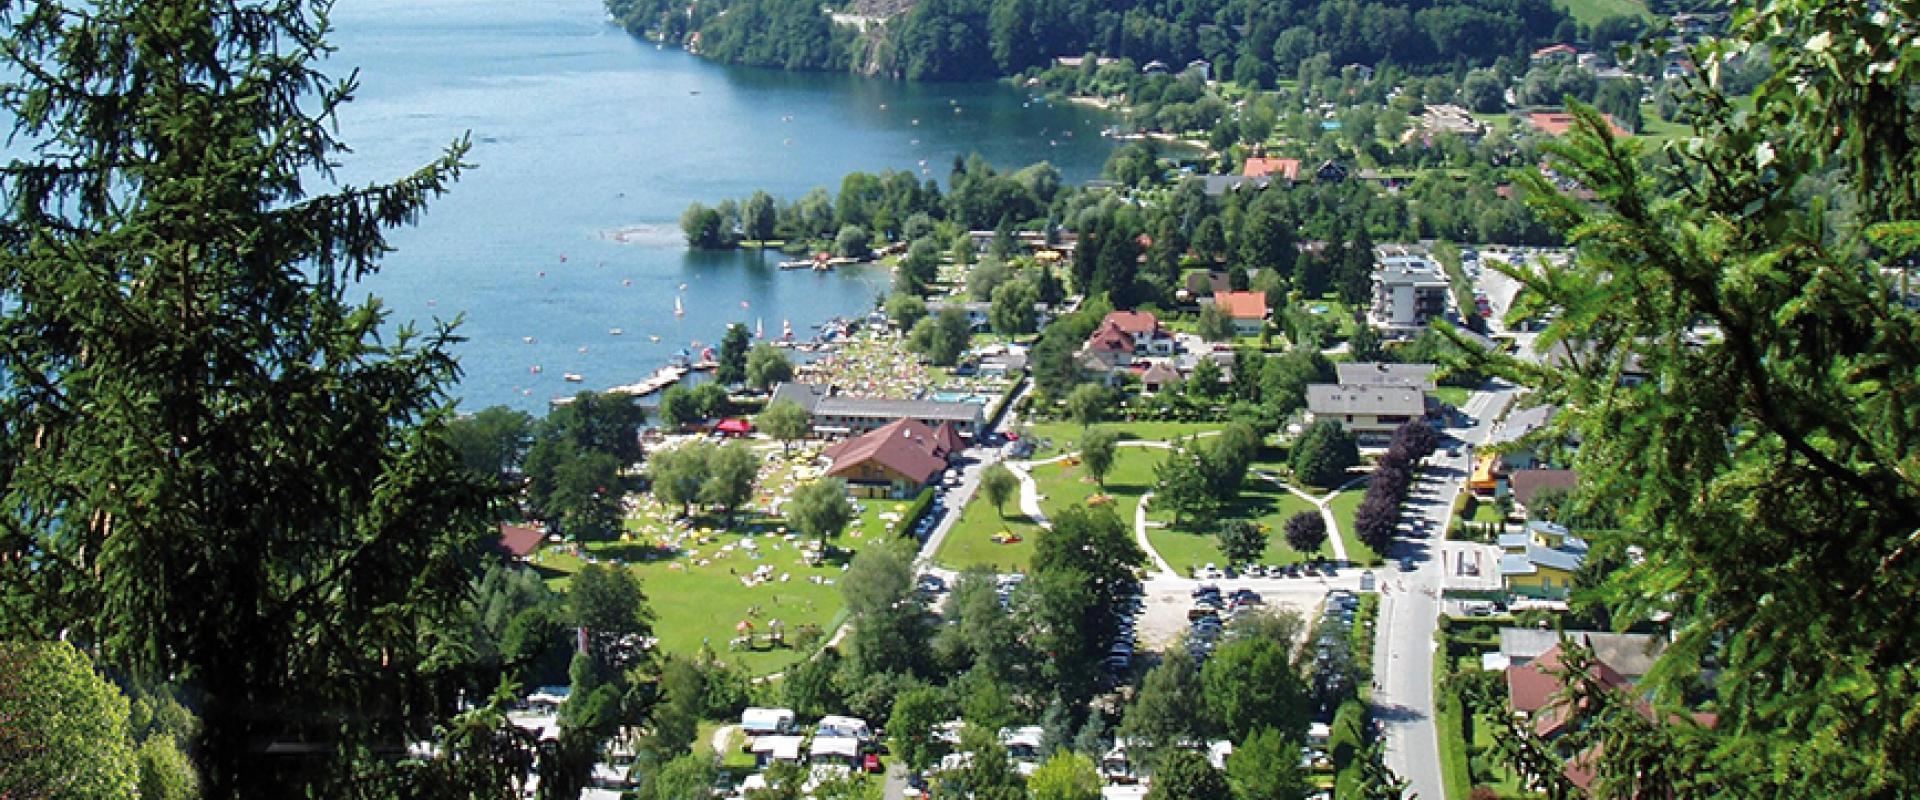 Seecamping Mössler Panorama